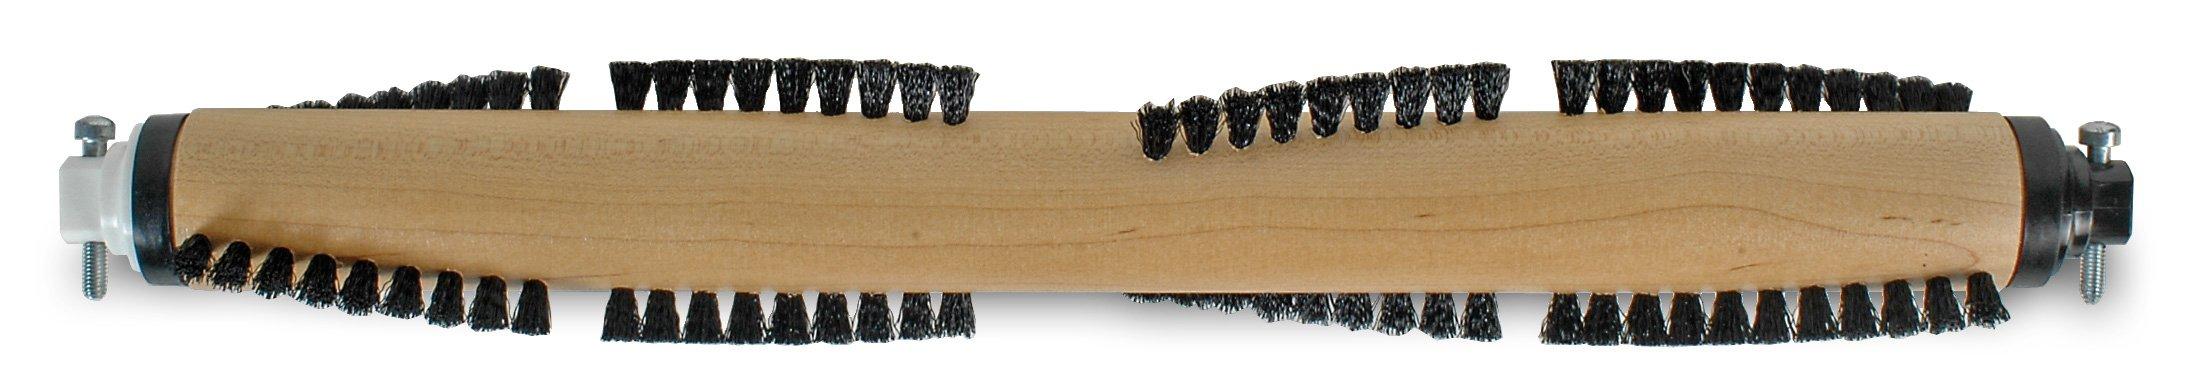 Kirby Ball Bearing Br Roll w/Magnet Wood Dowel, 152584